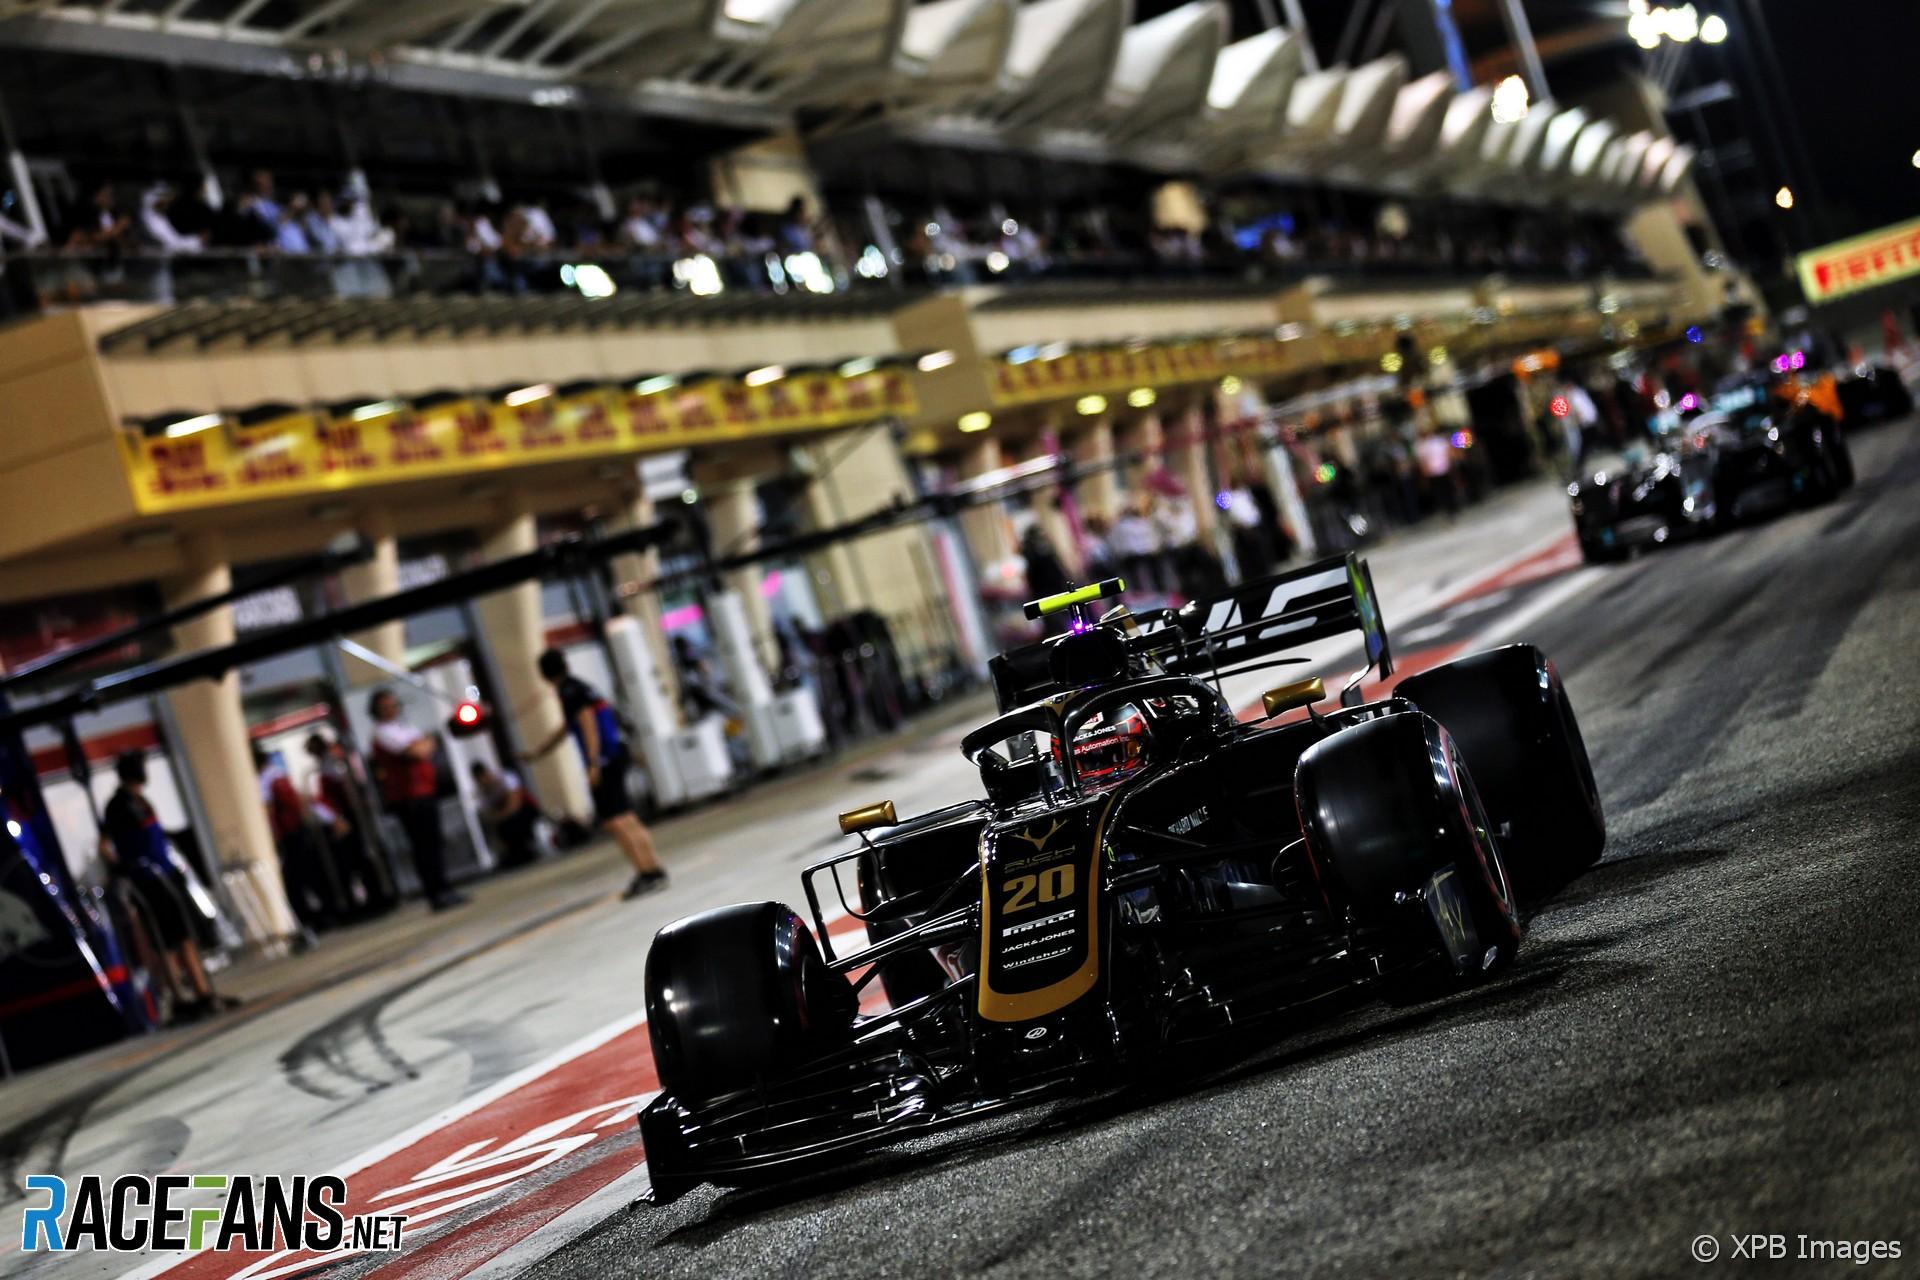 Kevin Magnussen, Haas, Bahrain International Circuit, 2019